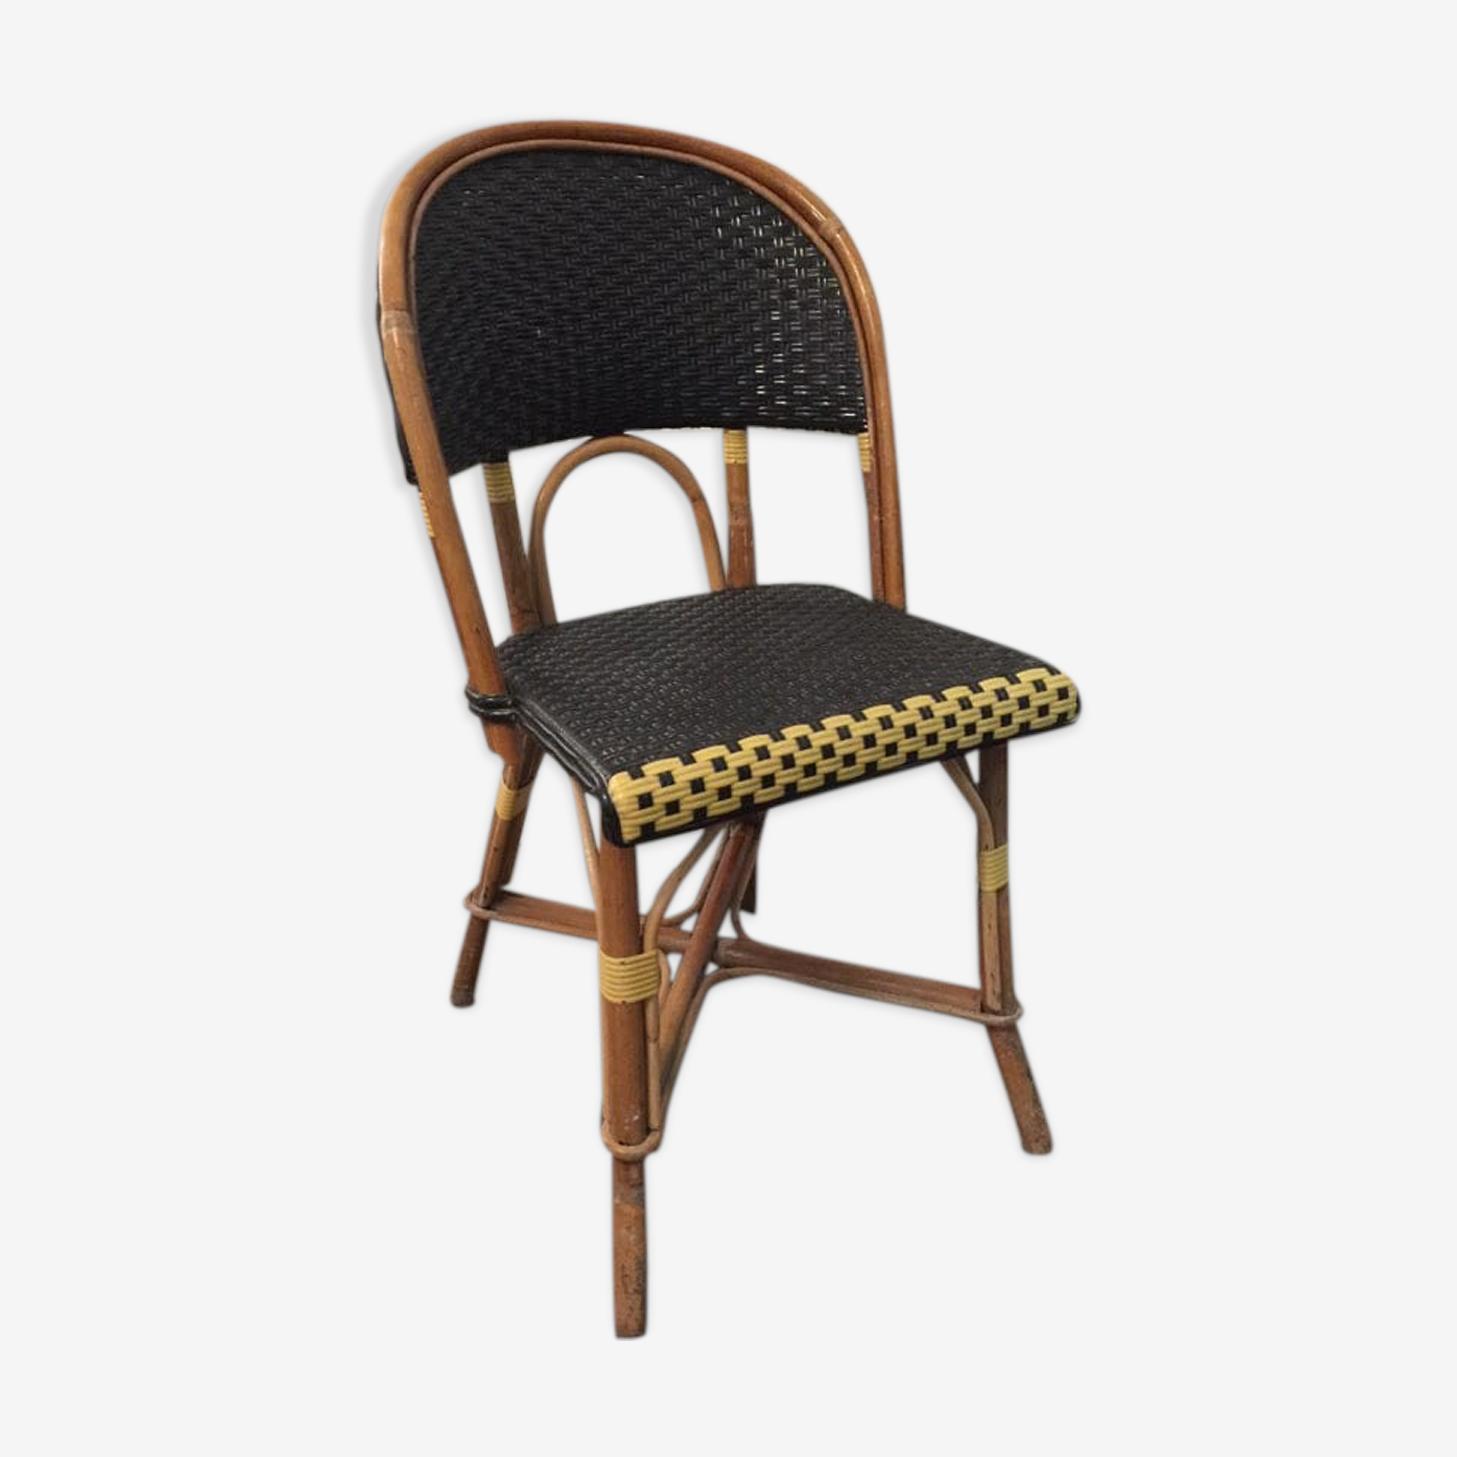 Chaise en rotin et osier Maison Gatti